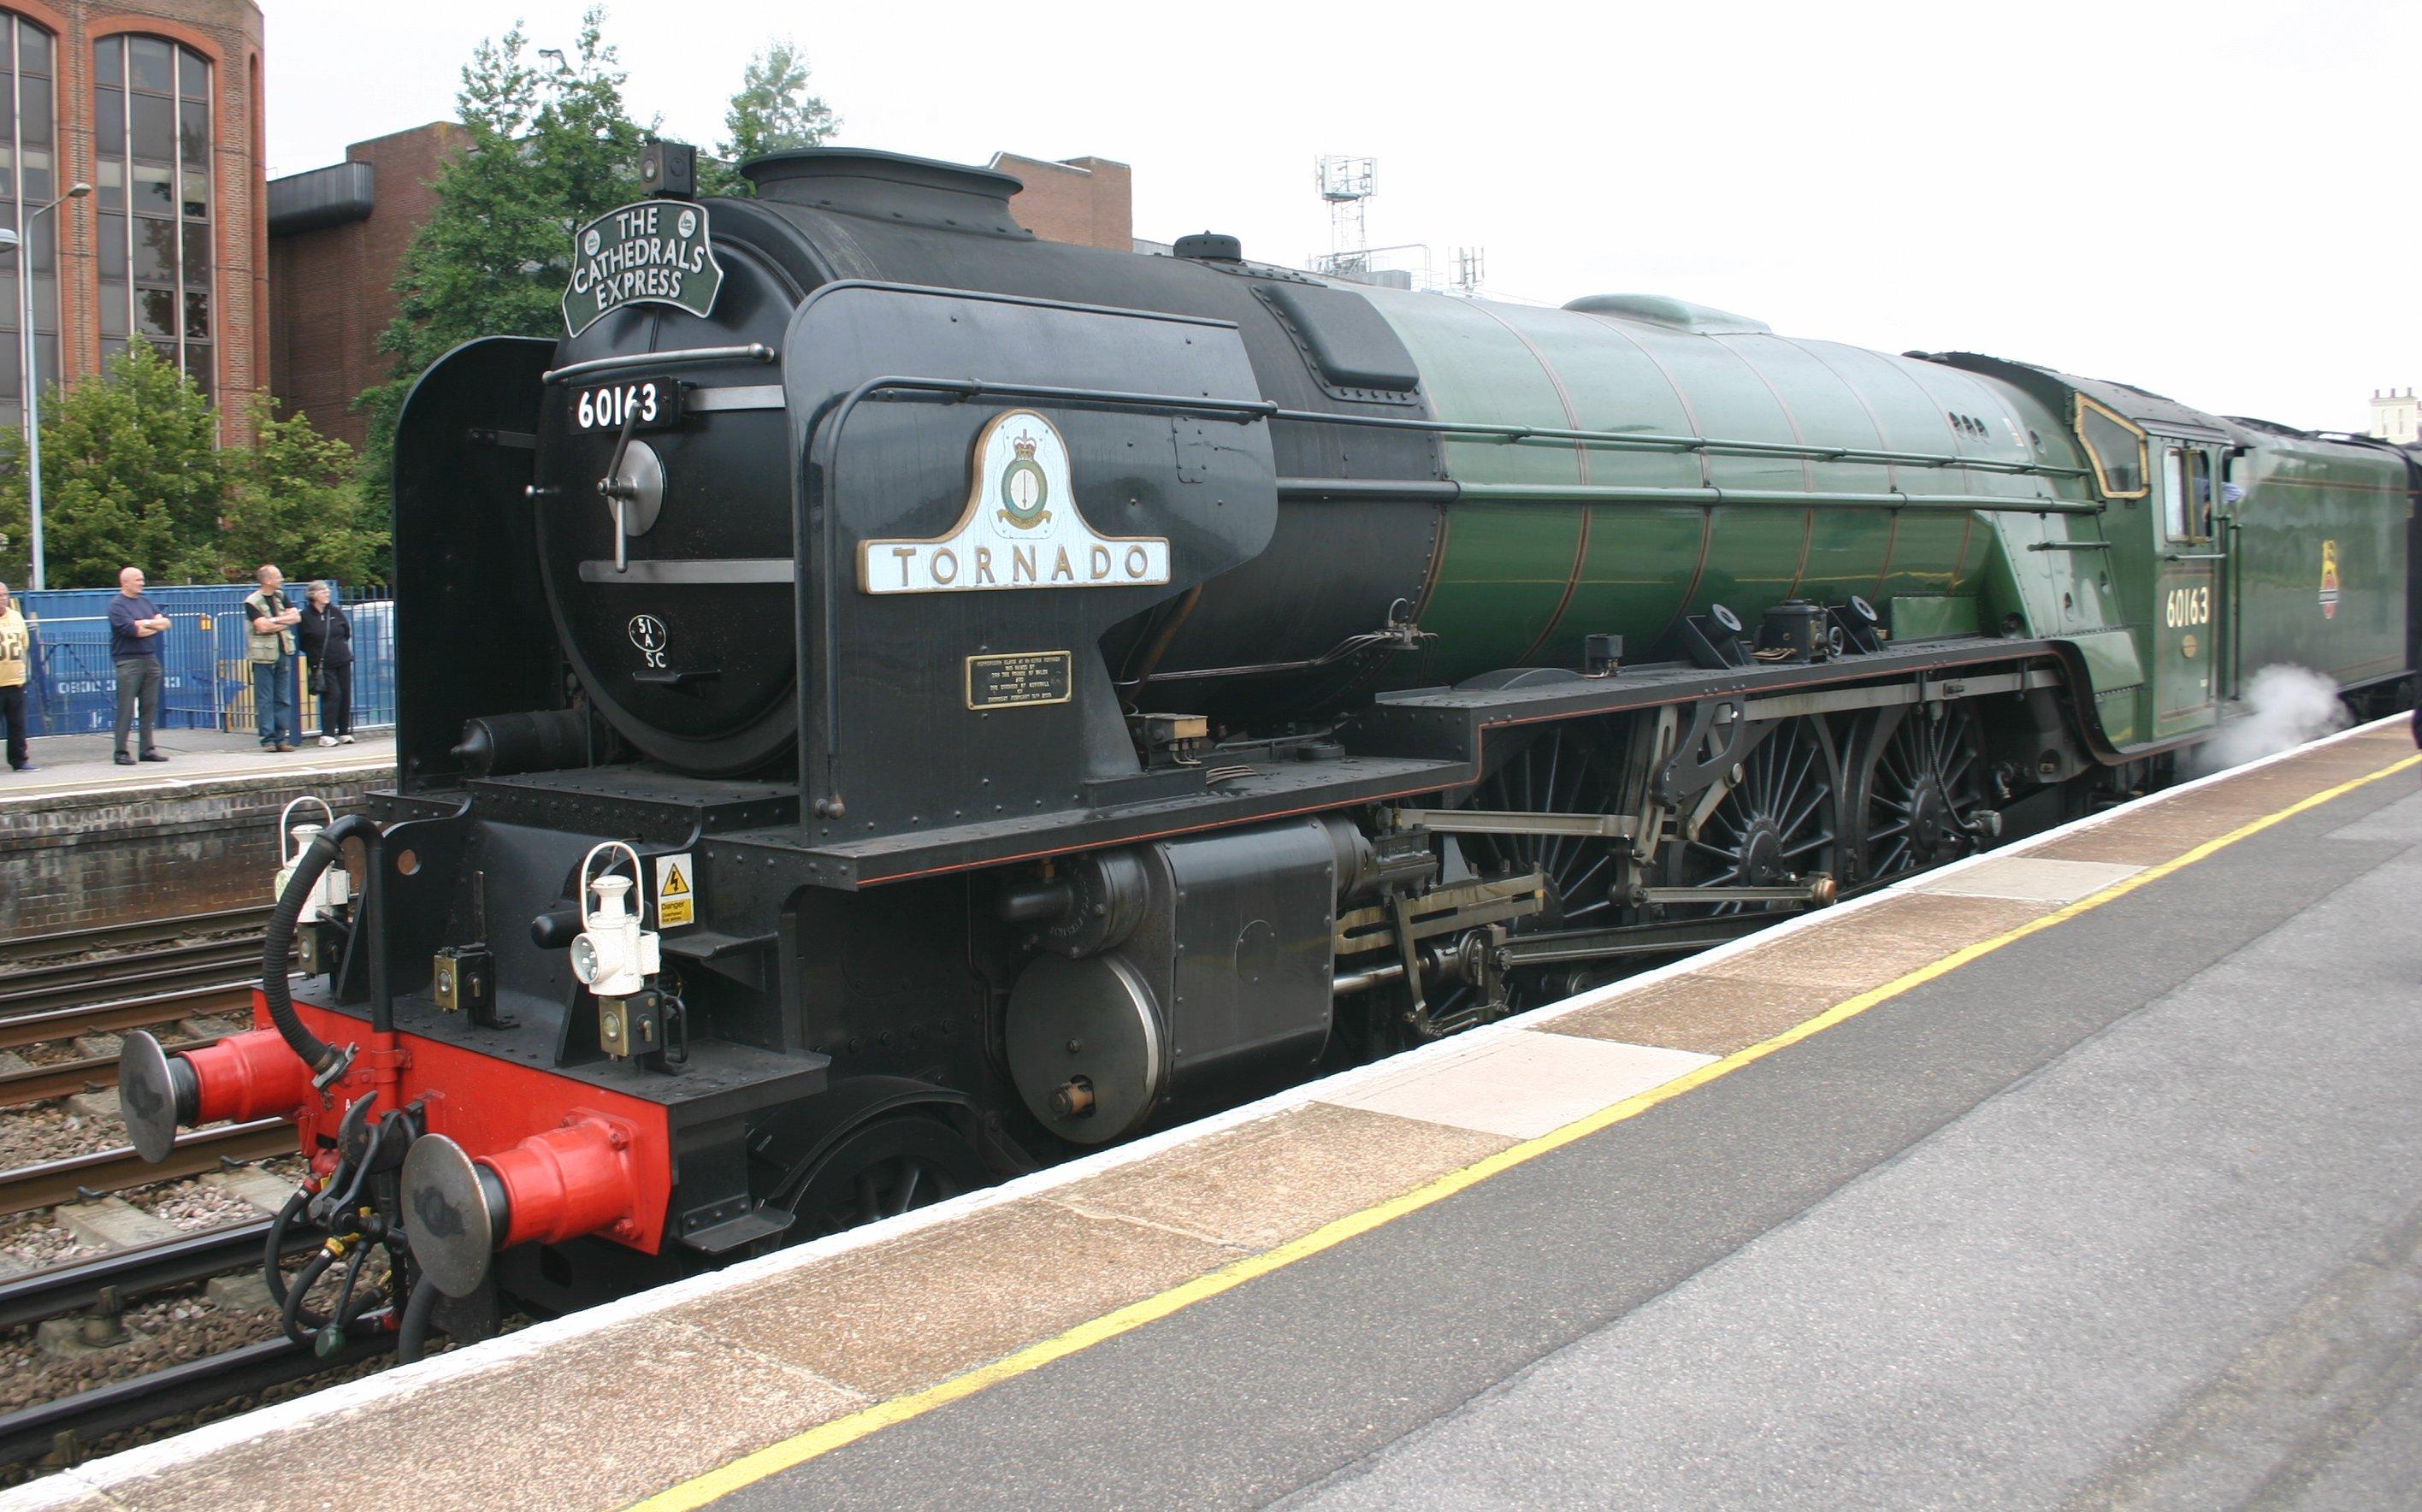 60163 Tornado Locomotive